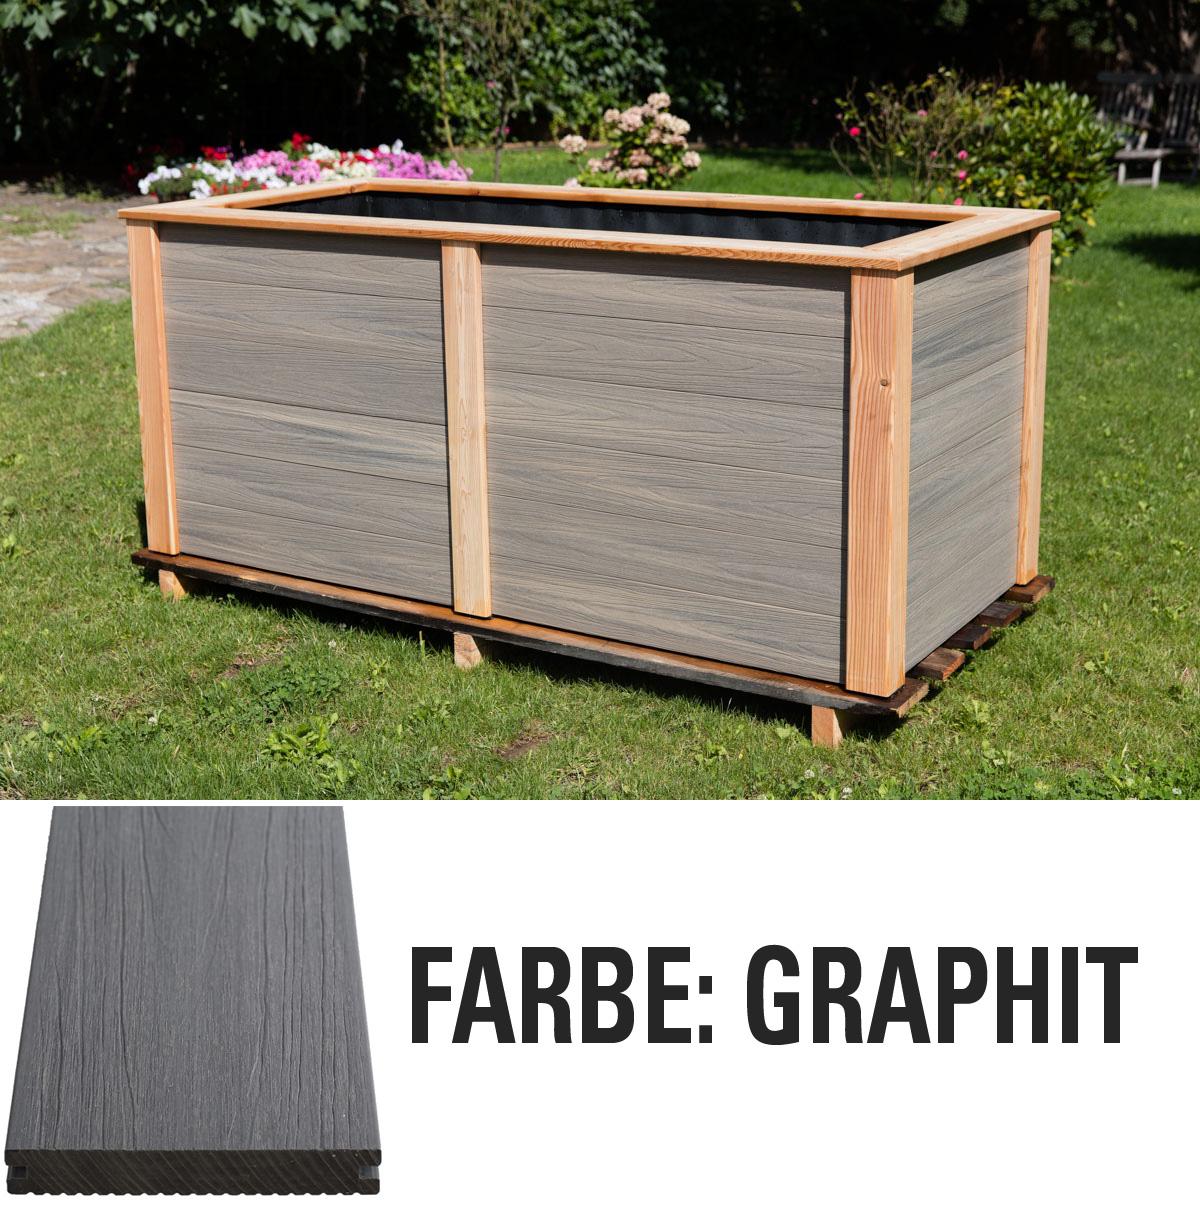 wpc bausatz hochbeete garten meyer parkett online shop. Black Bedroom Furniture Sets. Home Design Ideas